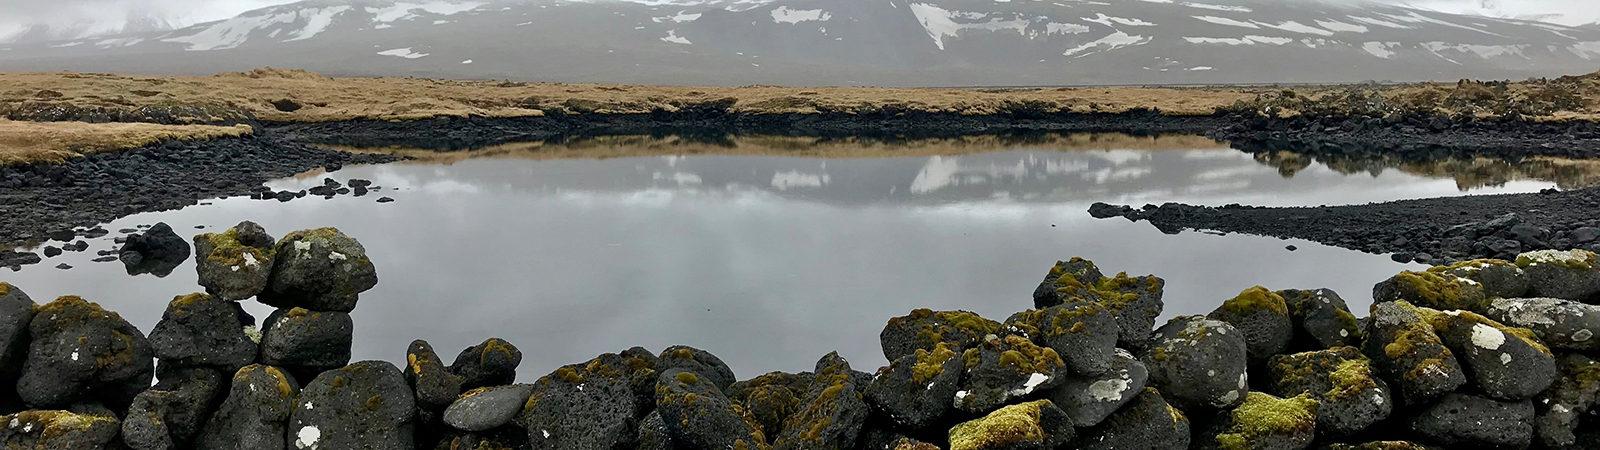 Iceland. Photo taken by Northland College student Alec Drachenberg